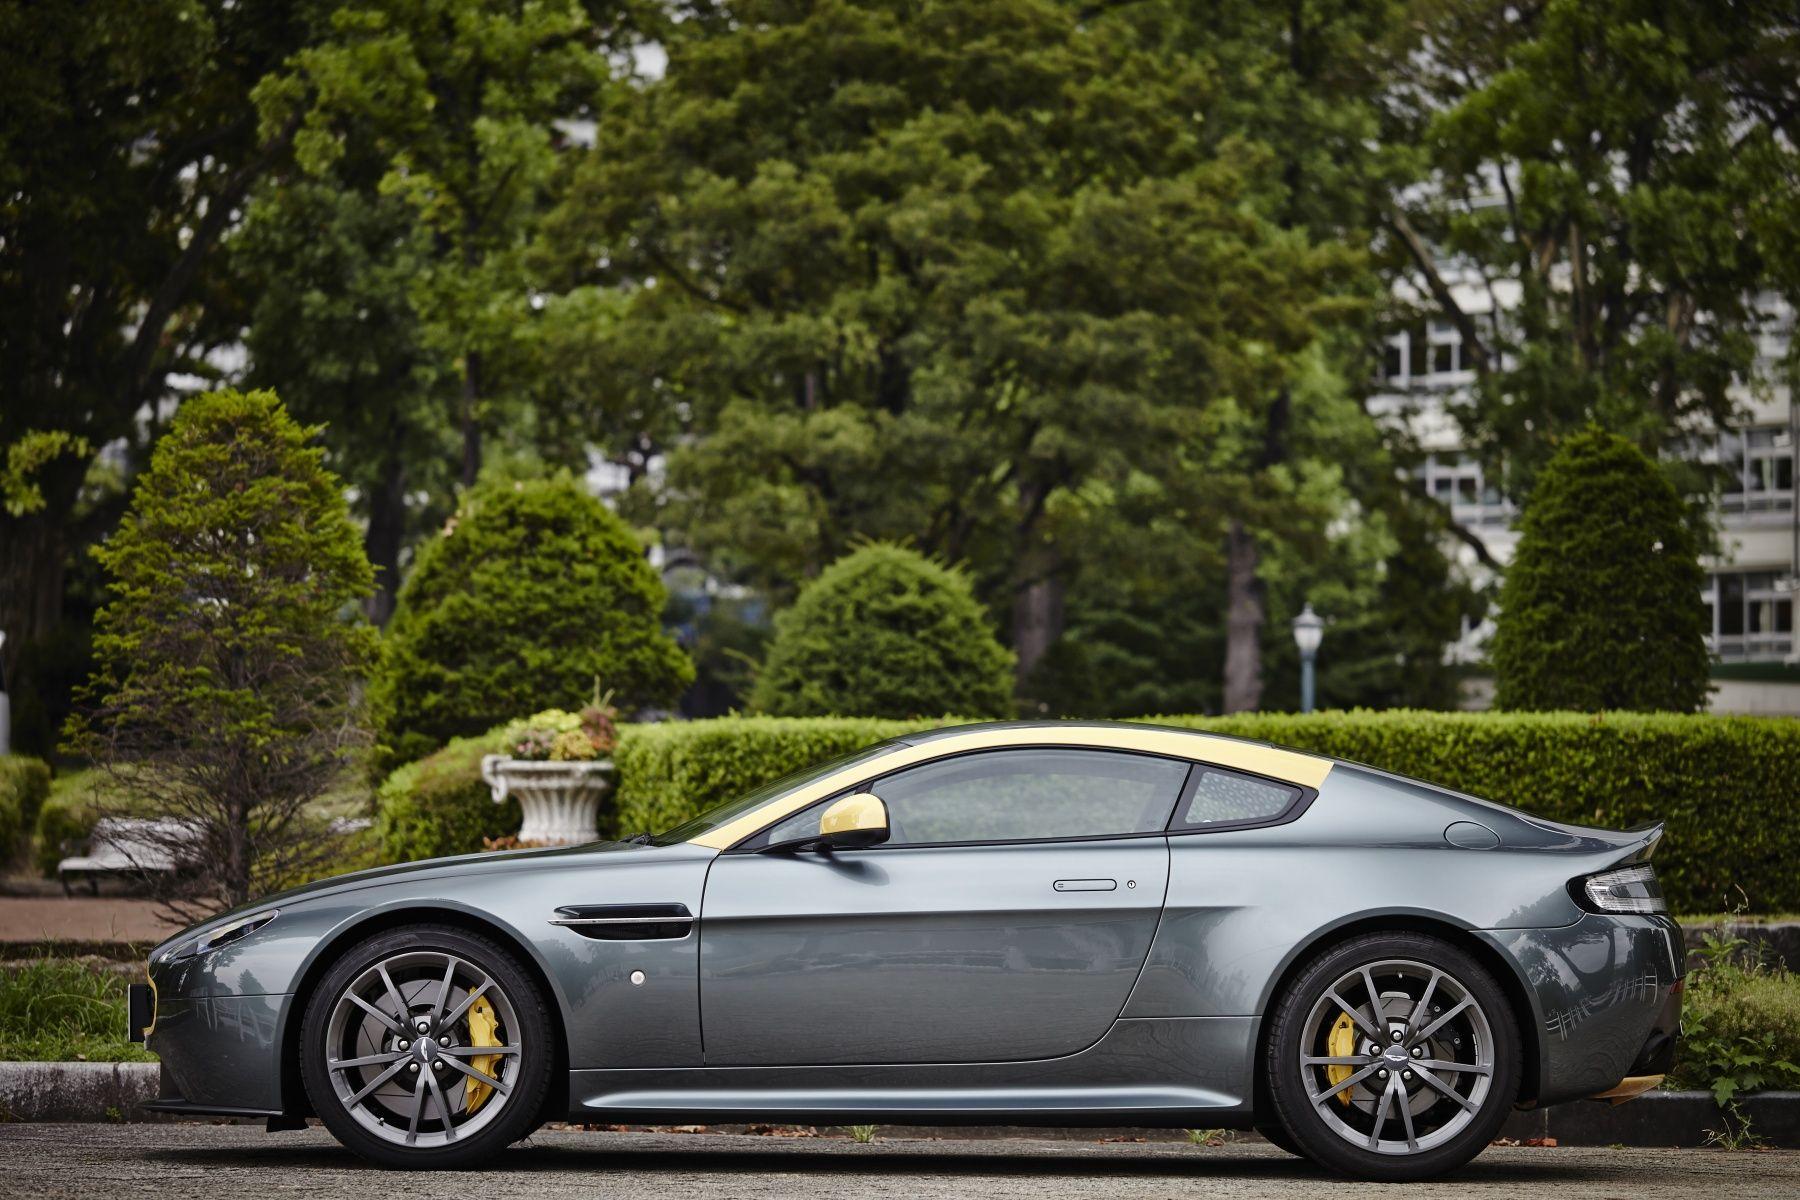 2016 Aston Martin V8 Vantage N430 Classic Driver Market Aston Martin Aston Martin V8 Aston